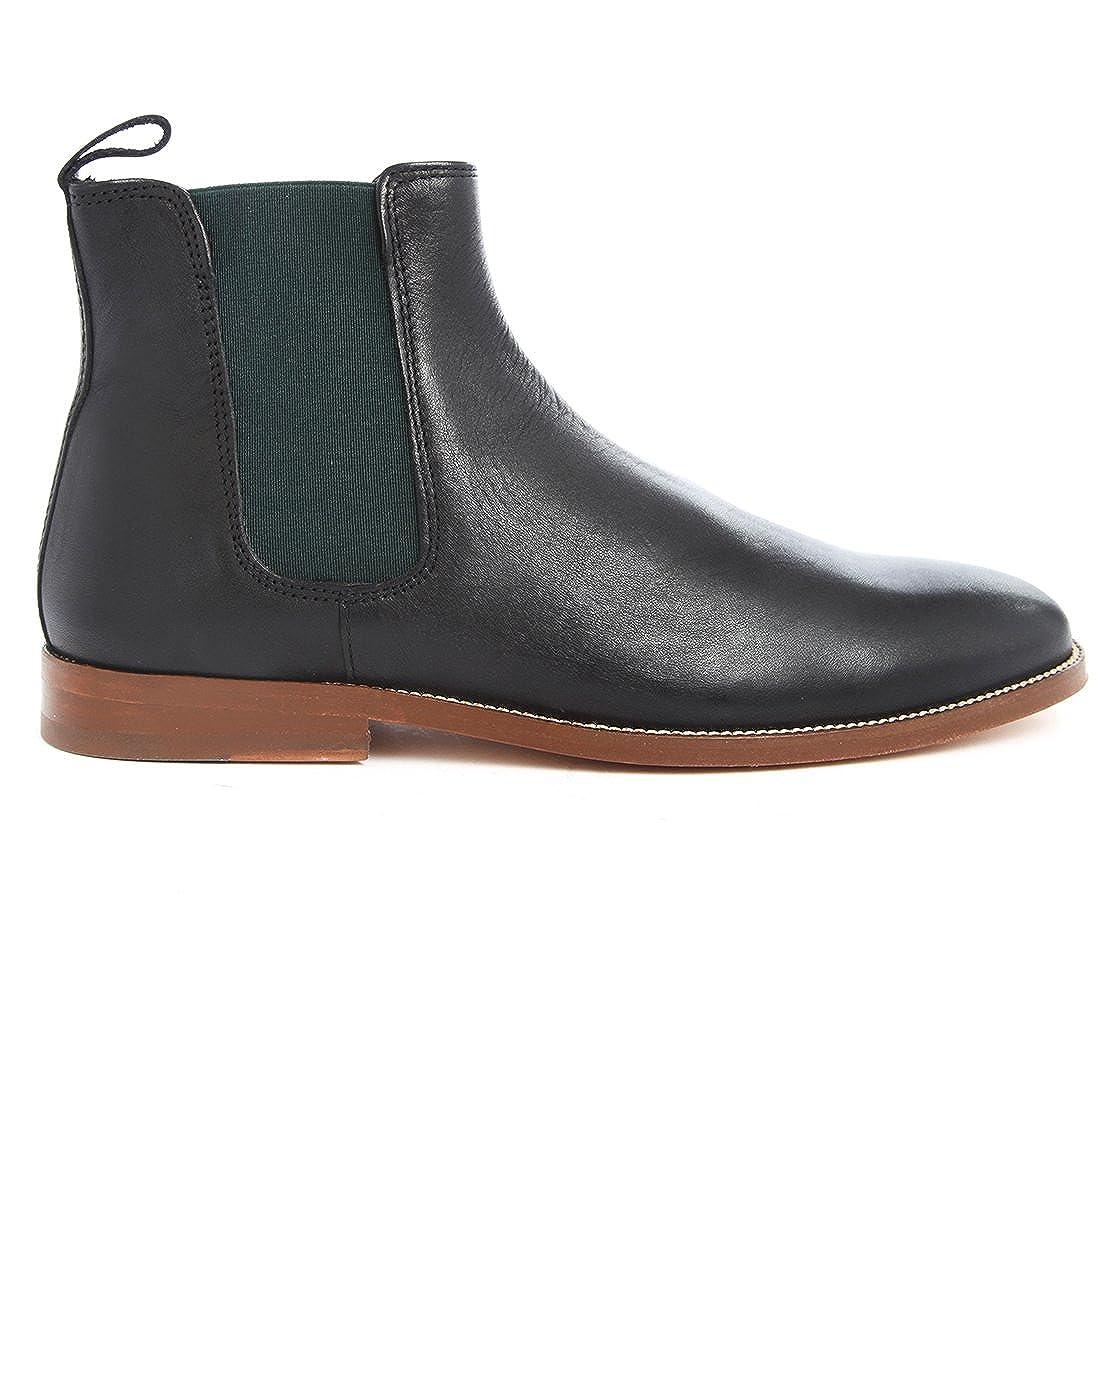 5e9f9c99a83 Bobbies - Boots - Men - Chelsea L'Horloger Black Leather Boots with ...